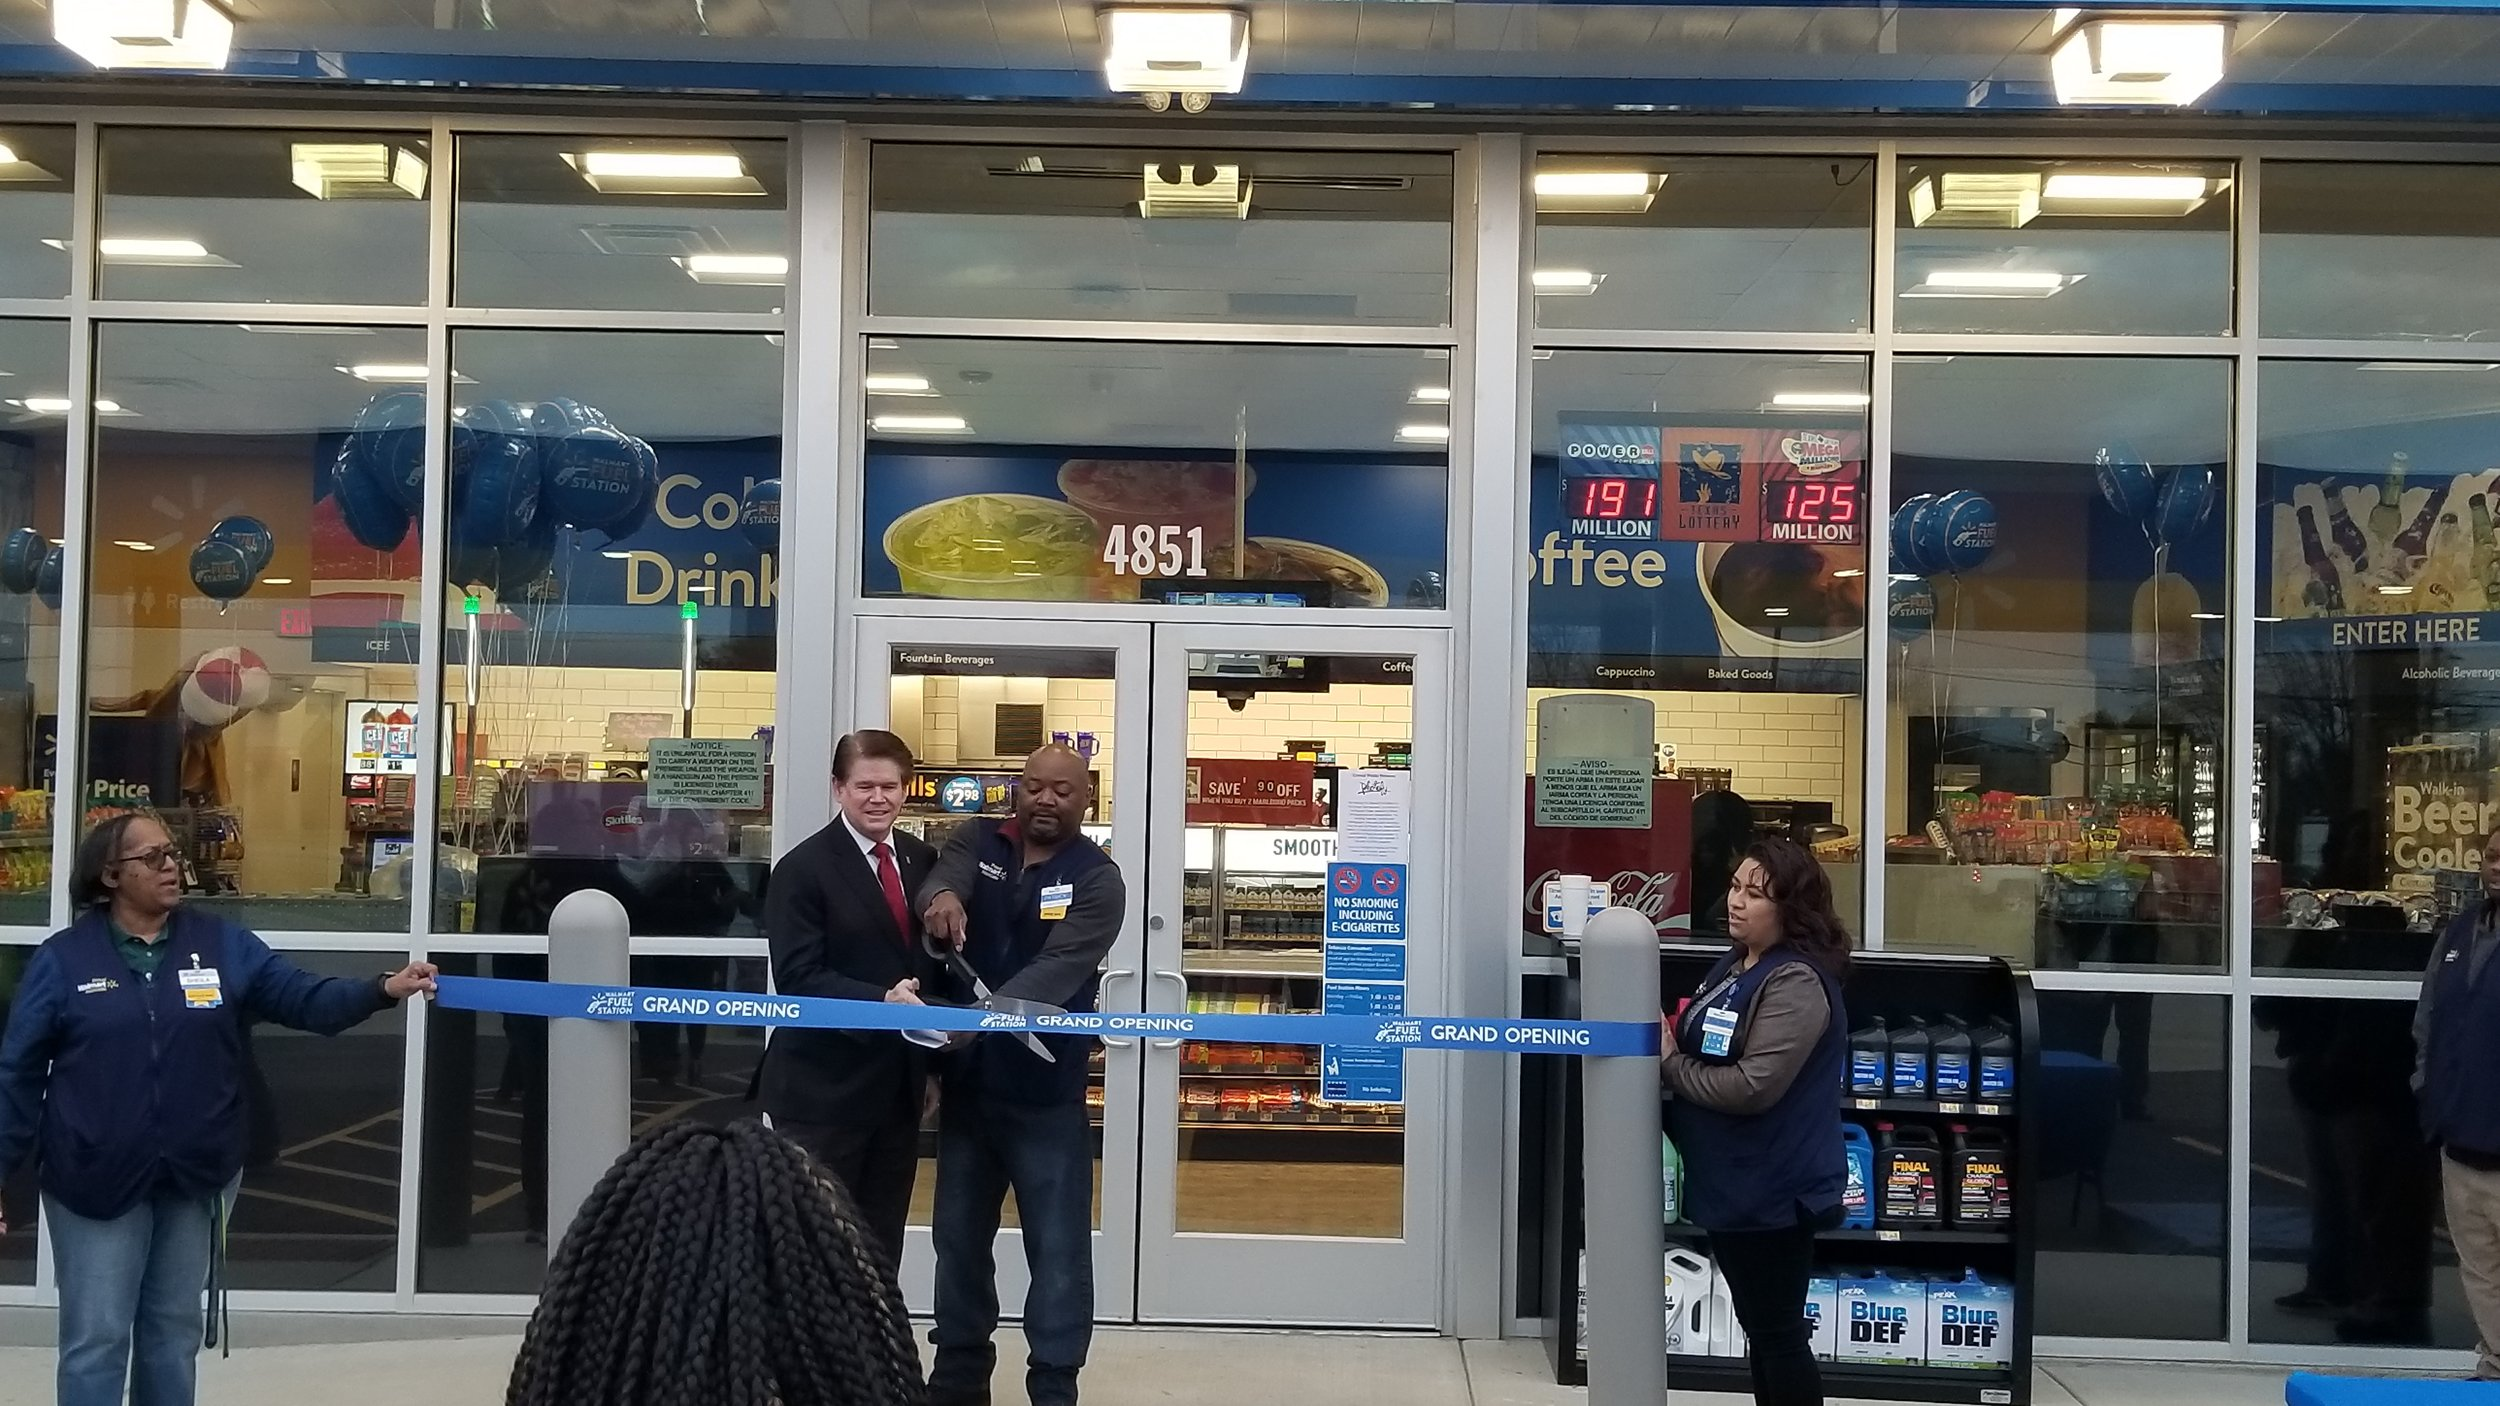 Verdad Project - Walmart TX Arlington - Ribbon Cutting.jpg